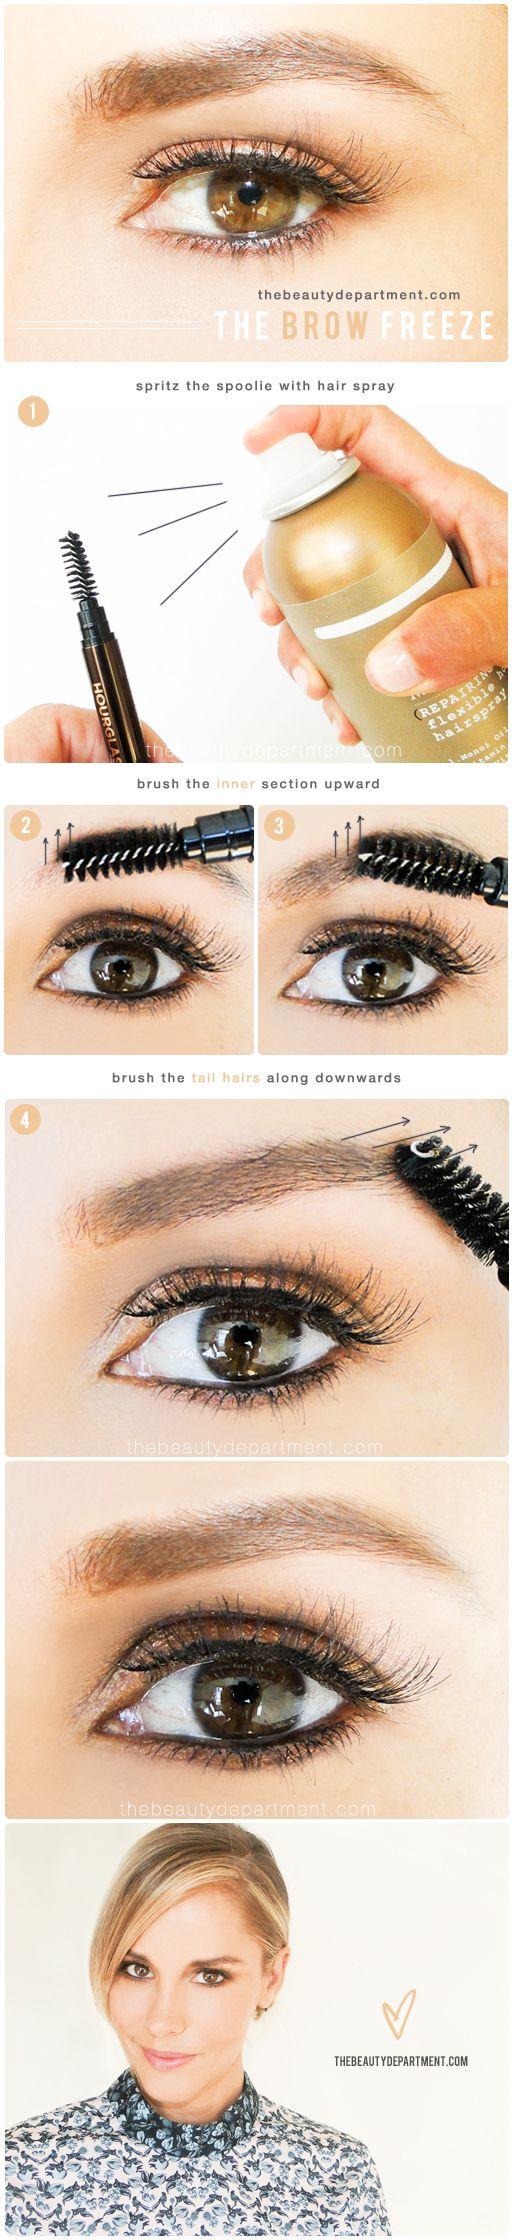 Diy Instant Brow Gel Makeup Pinterest Makeup Brows And Brow Gel